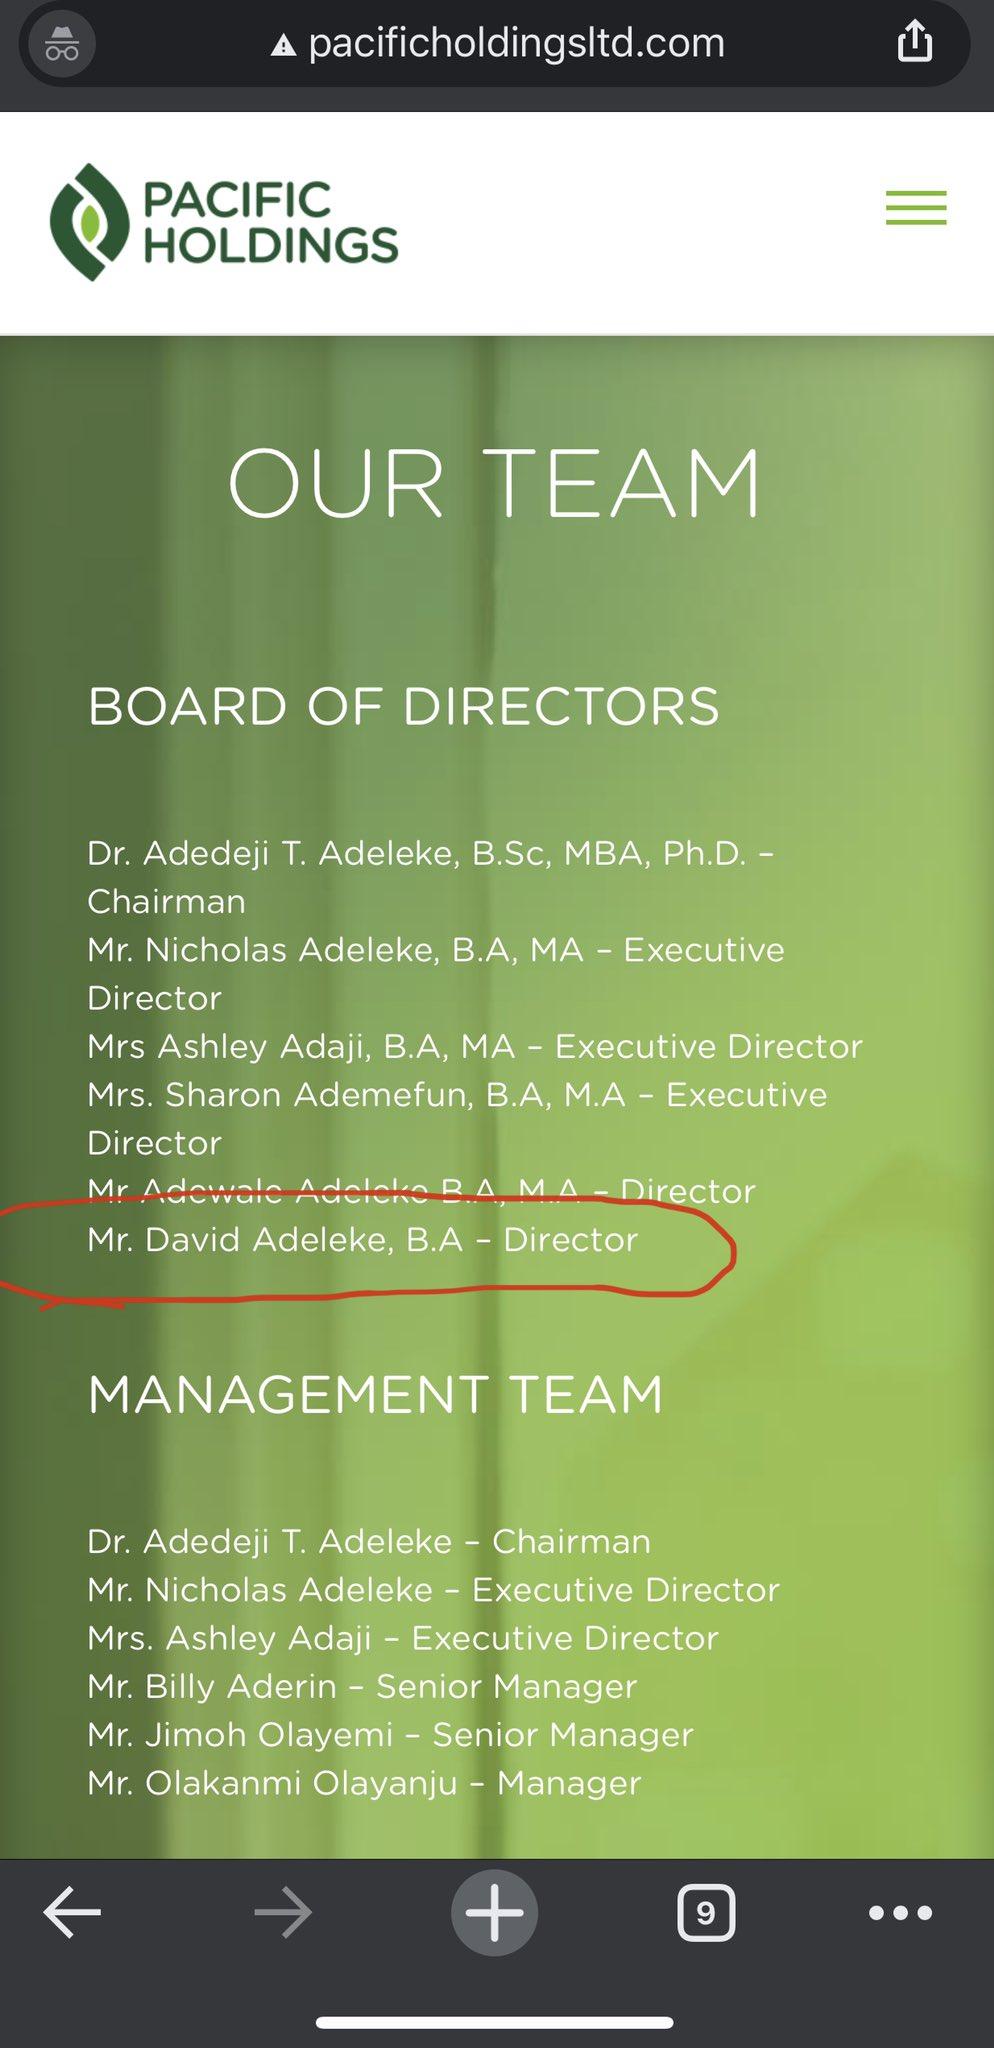 Screenshot of the company's website